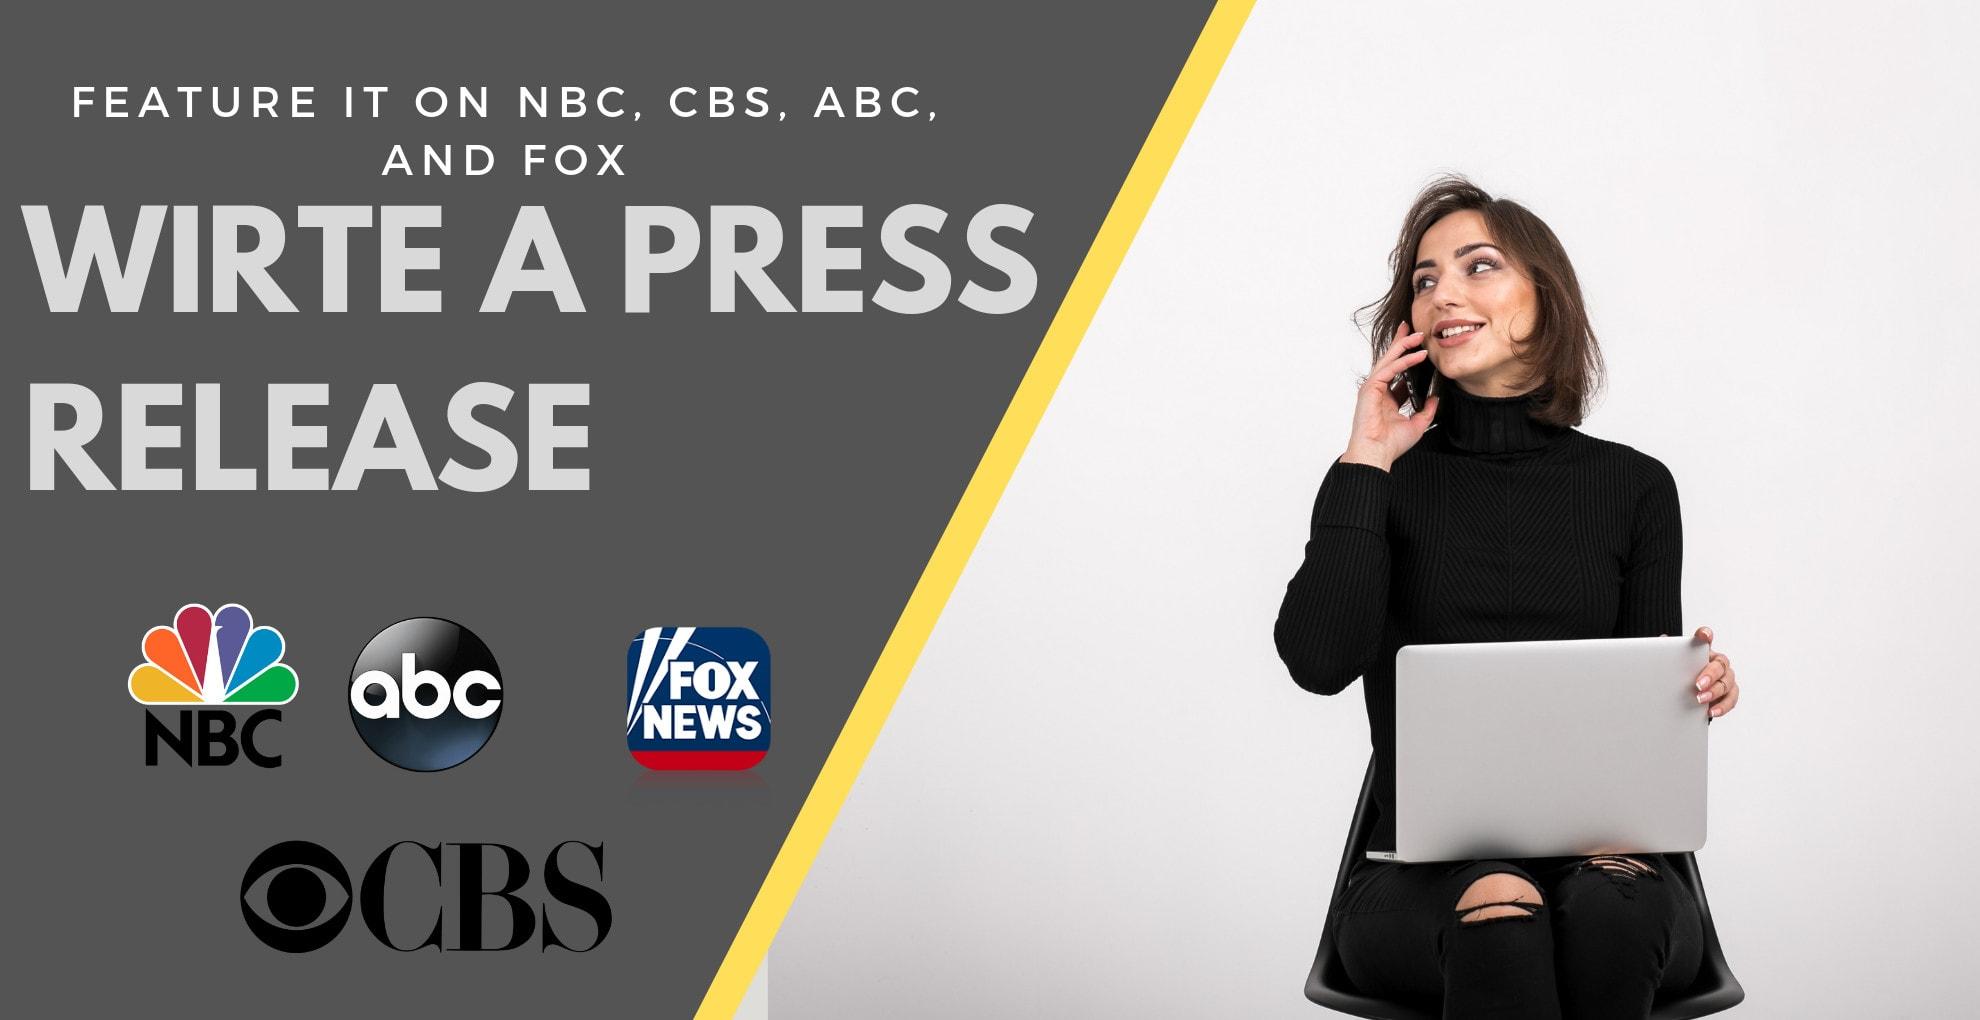 I will write press release and do distribution on fox CBS NBC ABC digital journal ETC